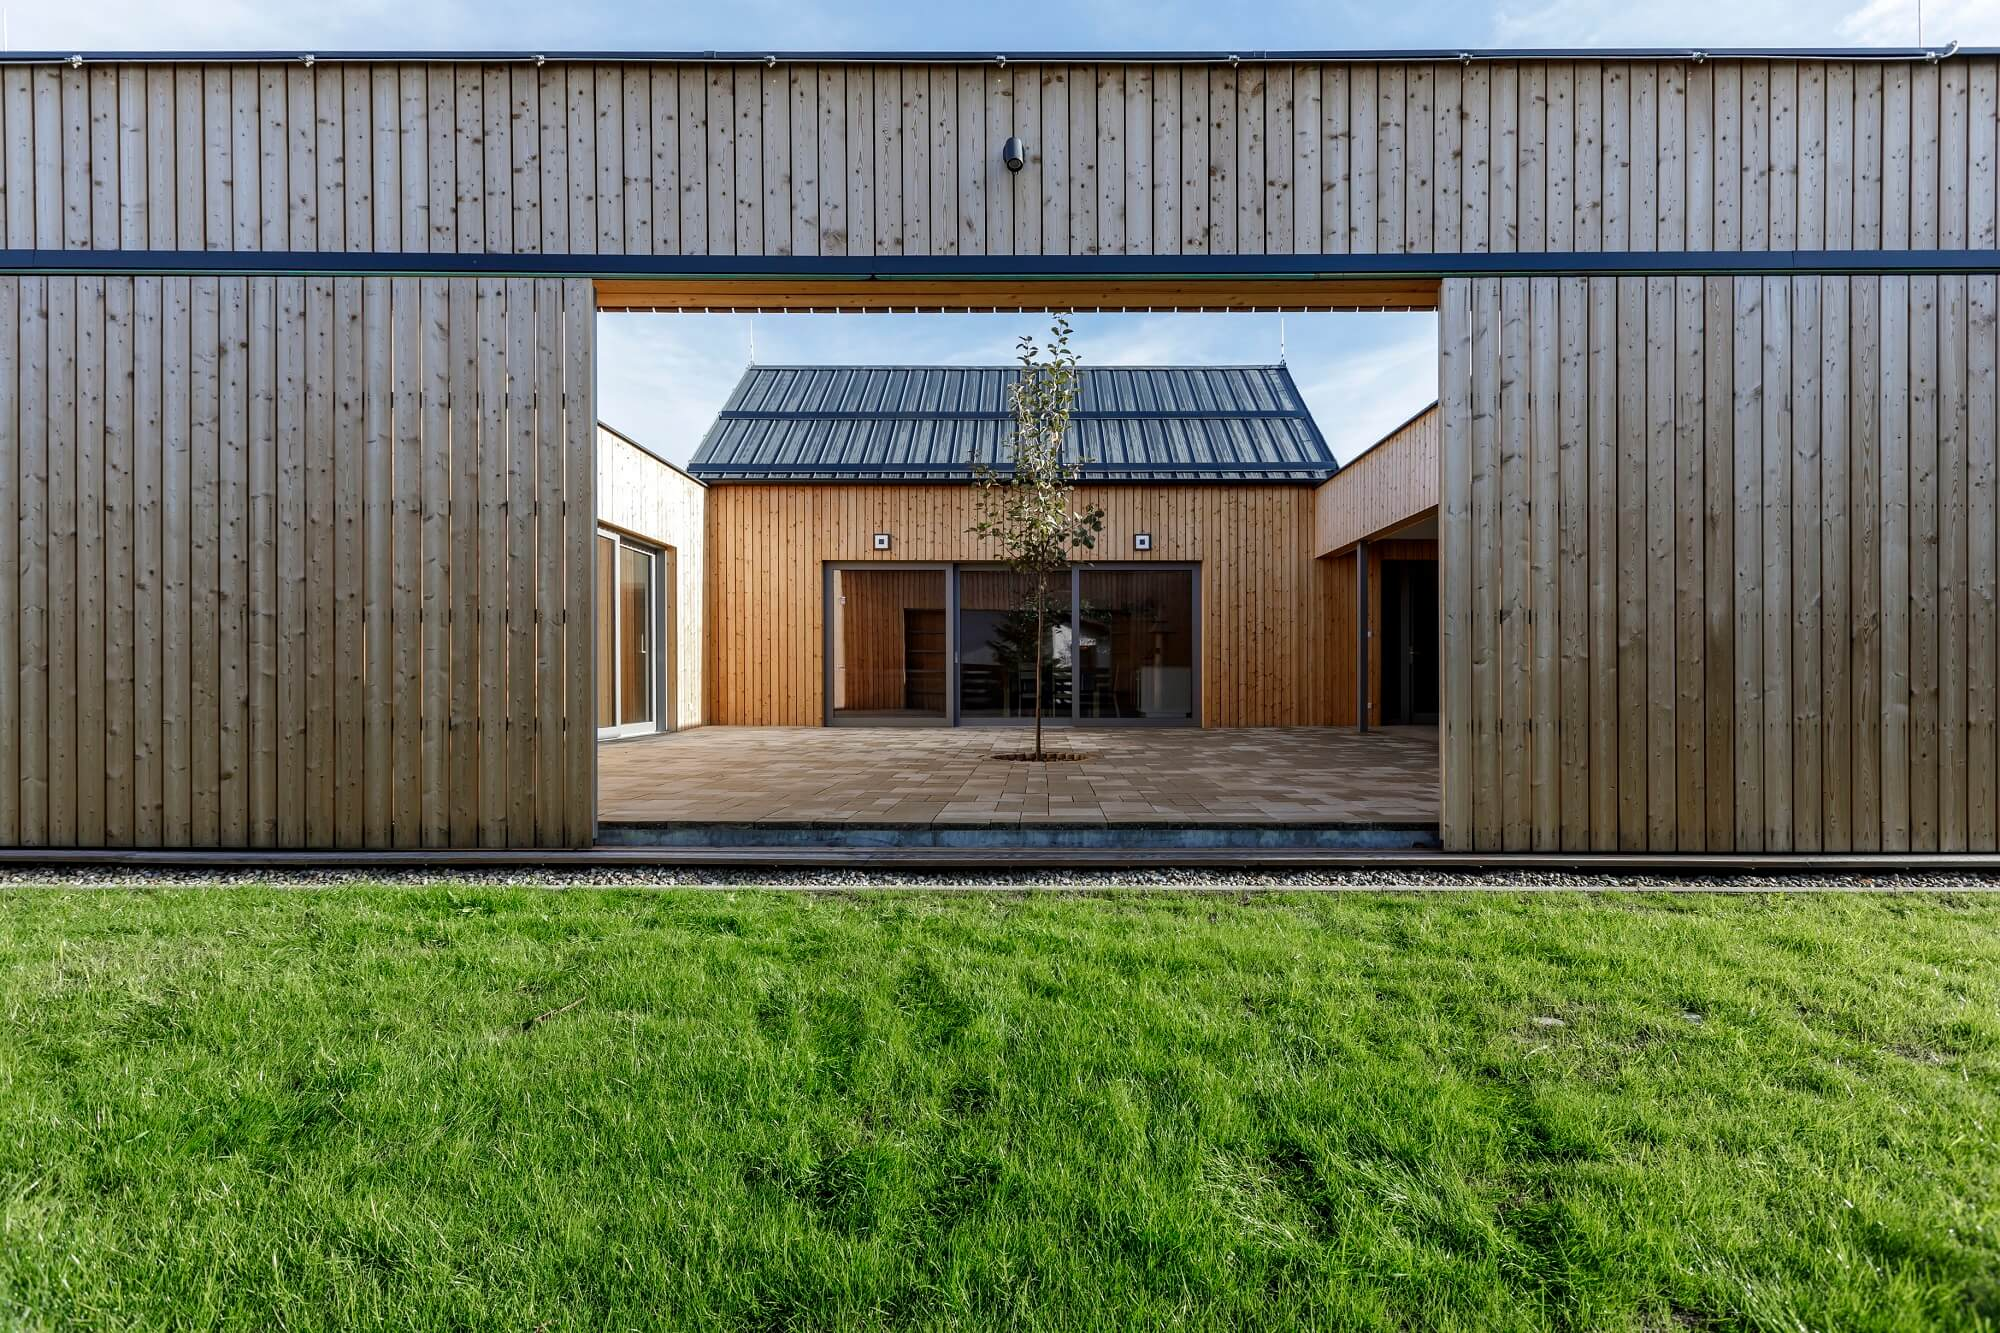 pokorny vikendovy dom